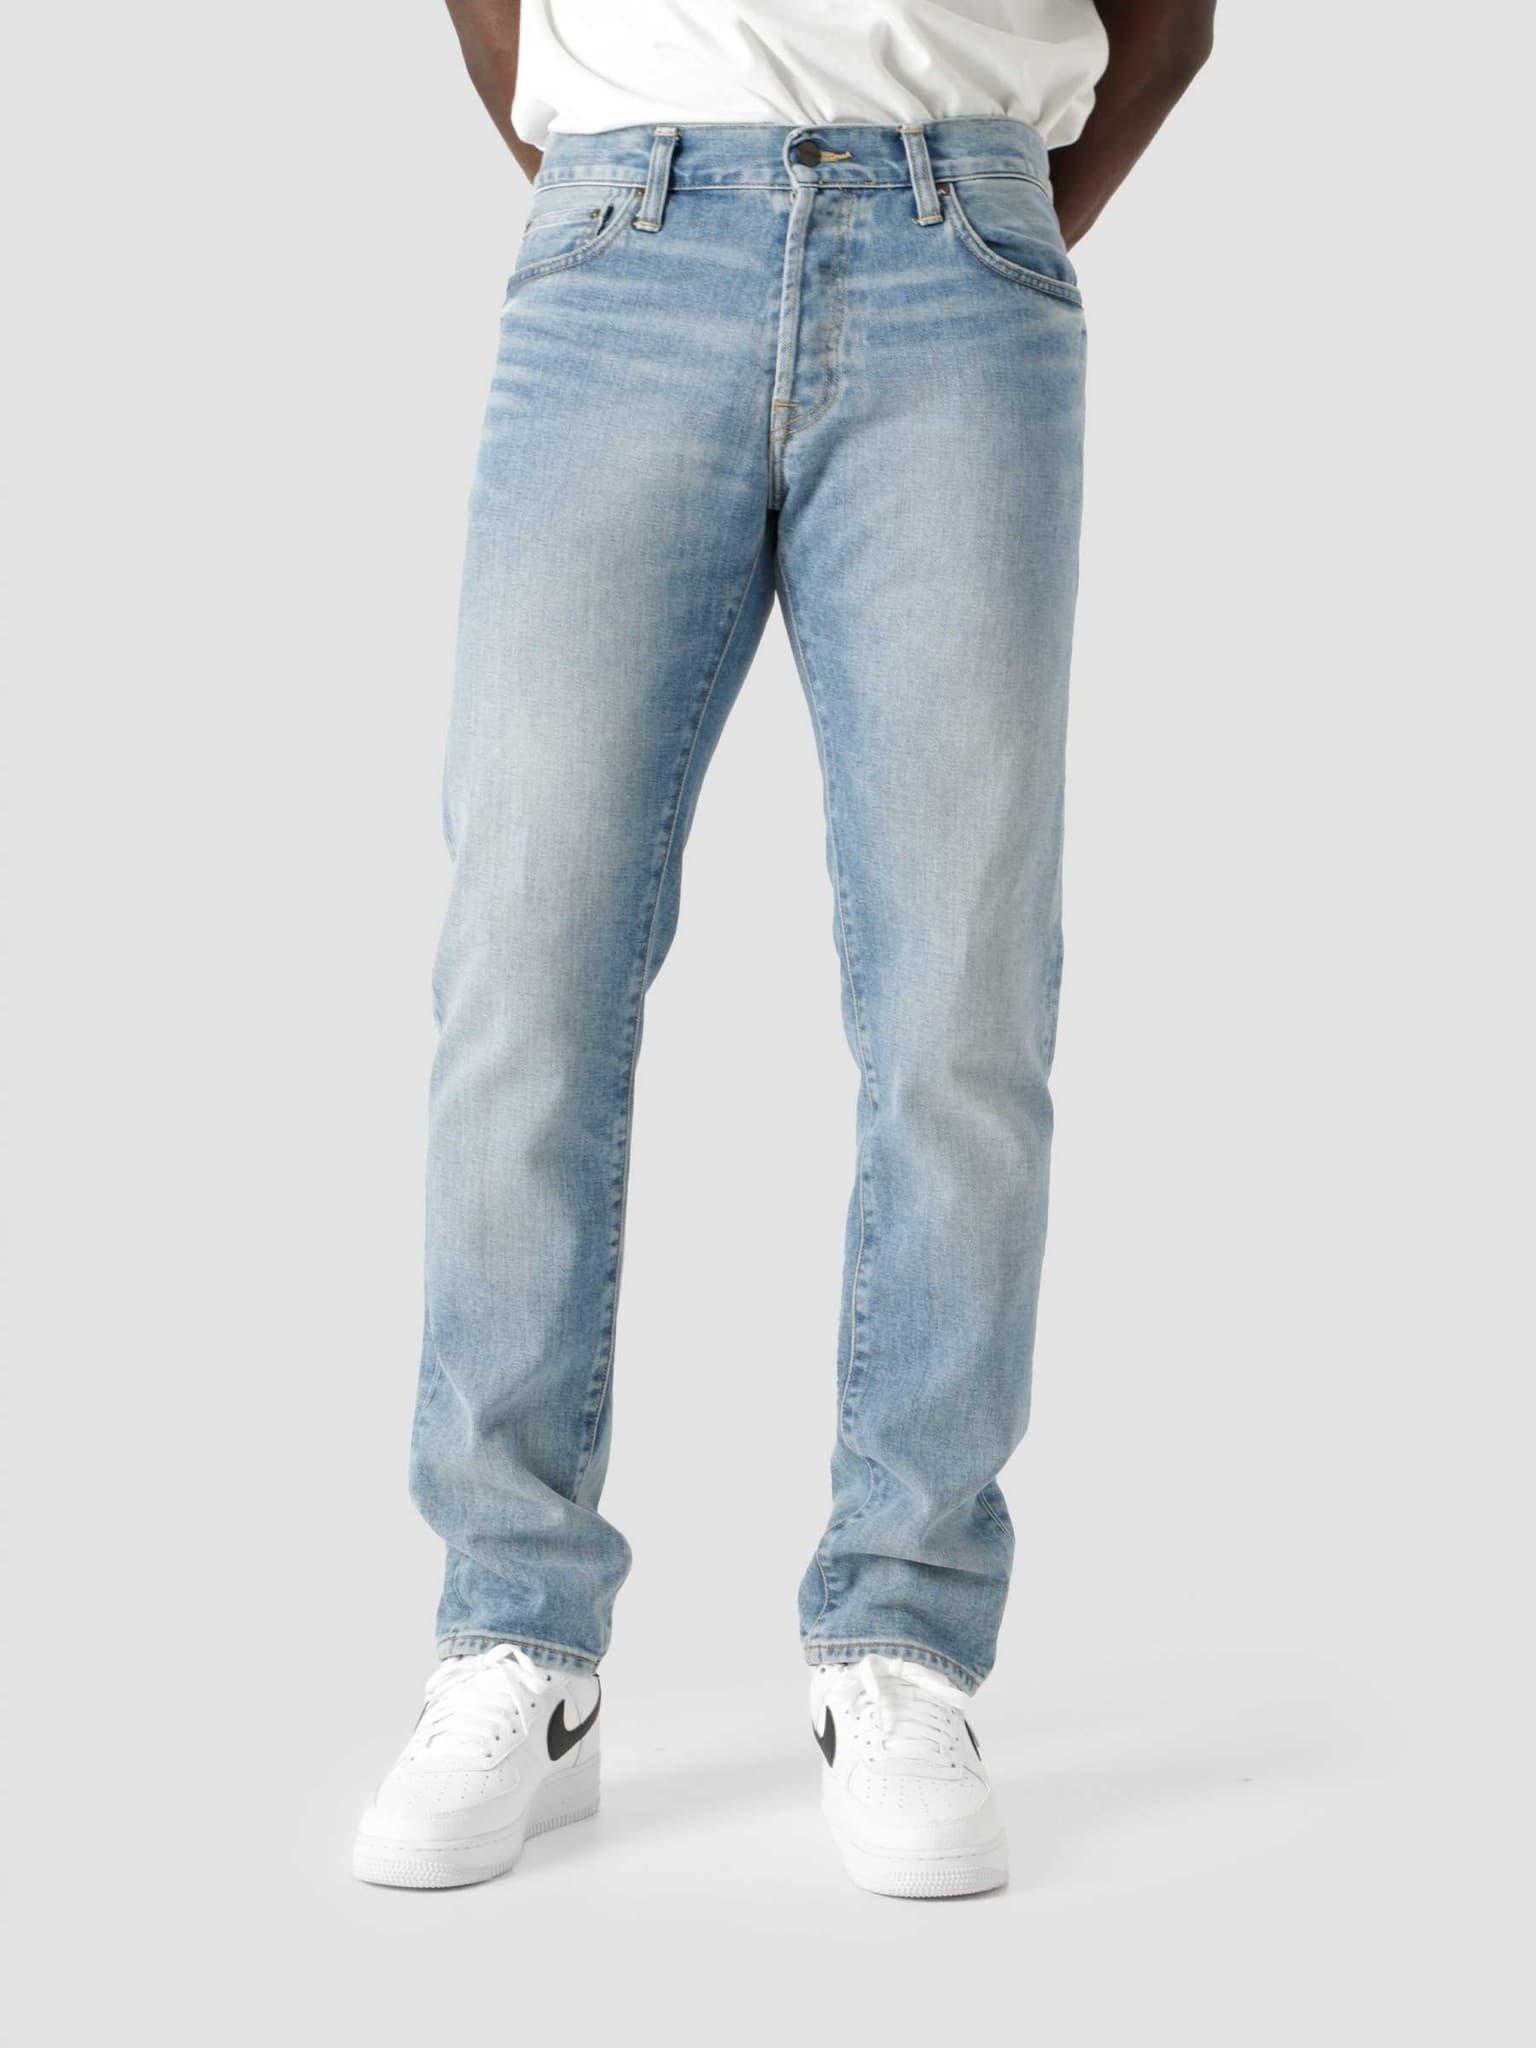 Klondike Pant Blue Light Used Wash I029207-01WI